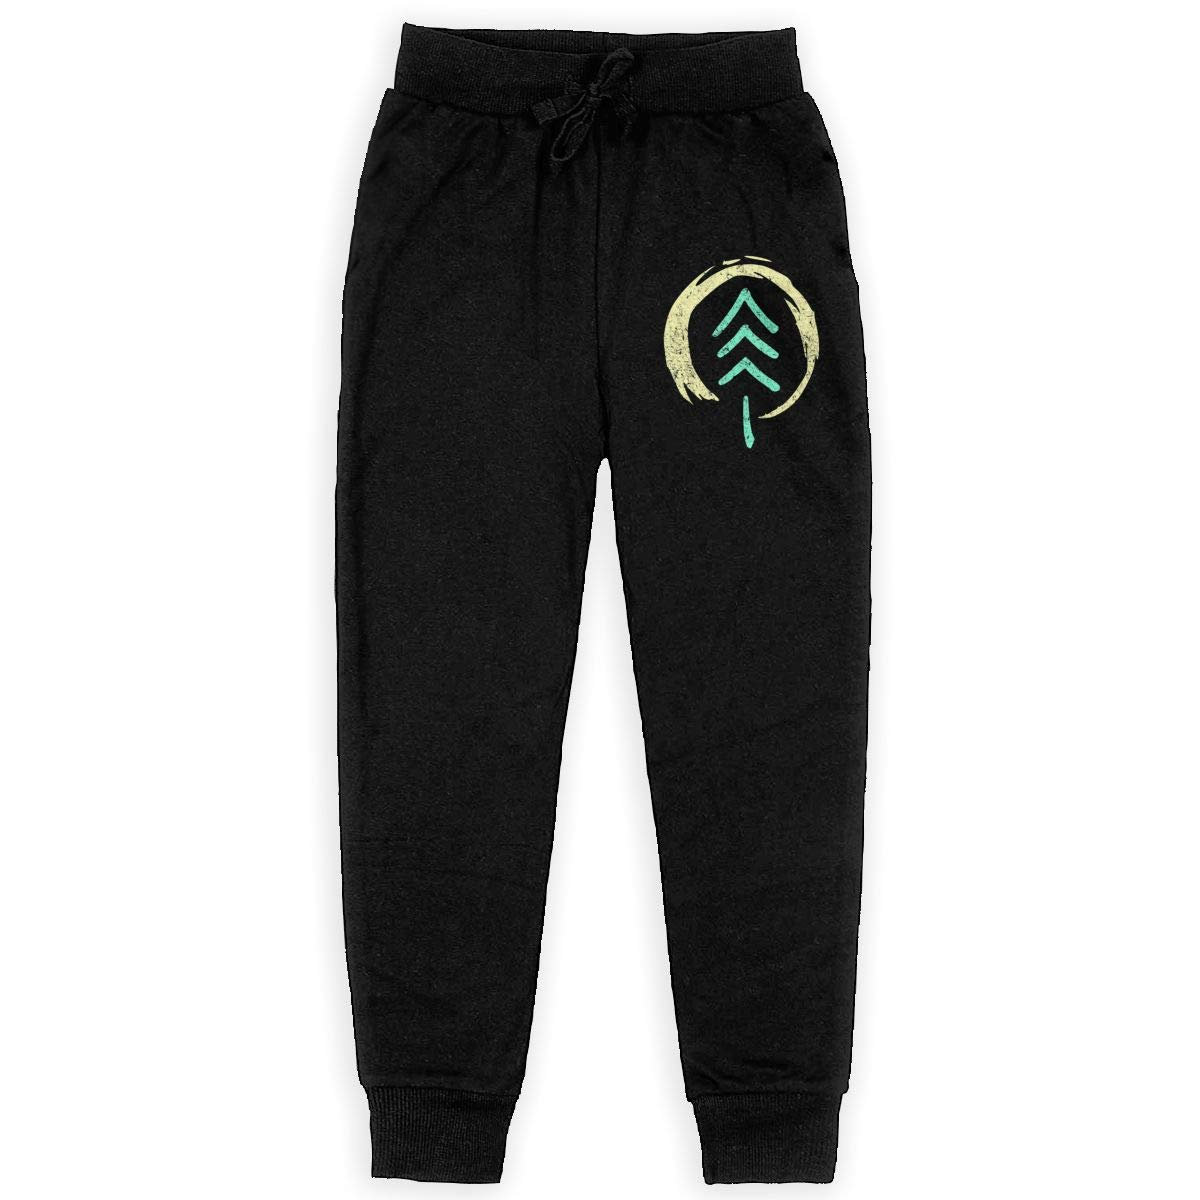 Kim Mittelstaedt Forest Soul Boys Big Active Basic Casual Pants Sweatpants for Boys Black